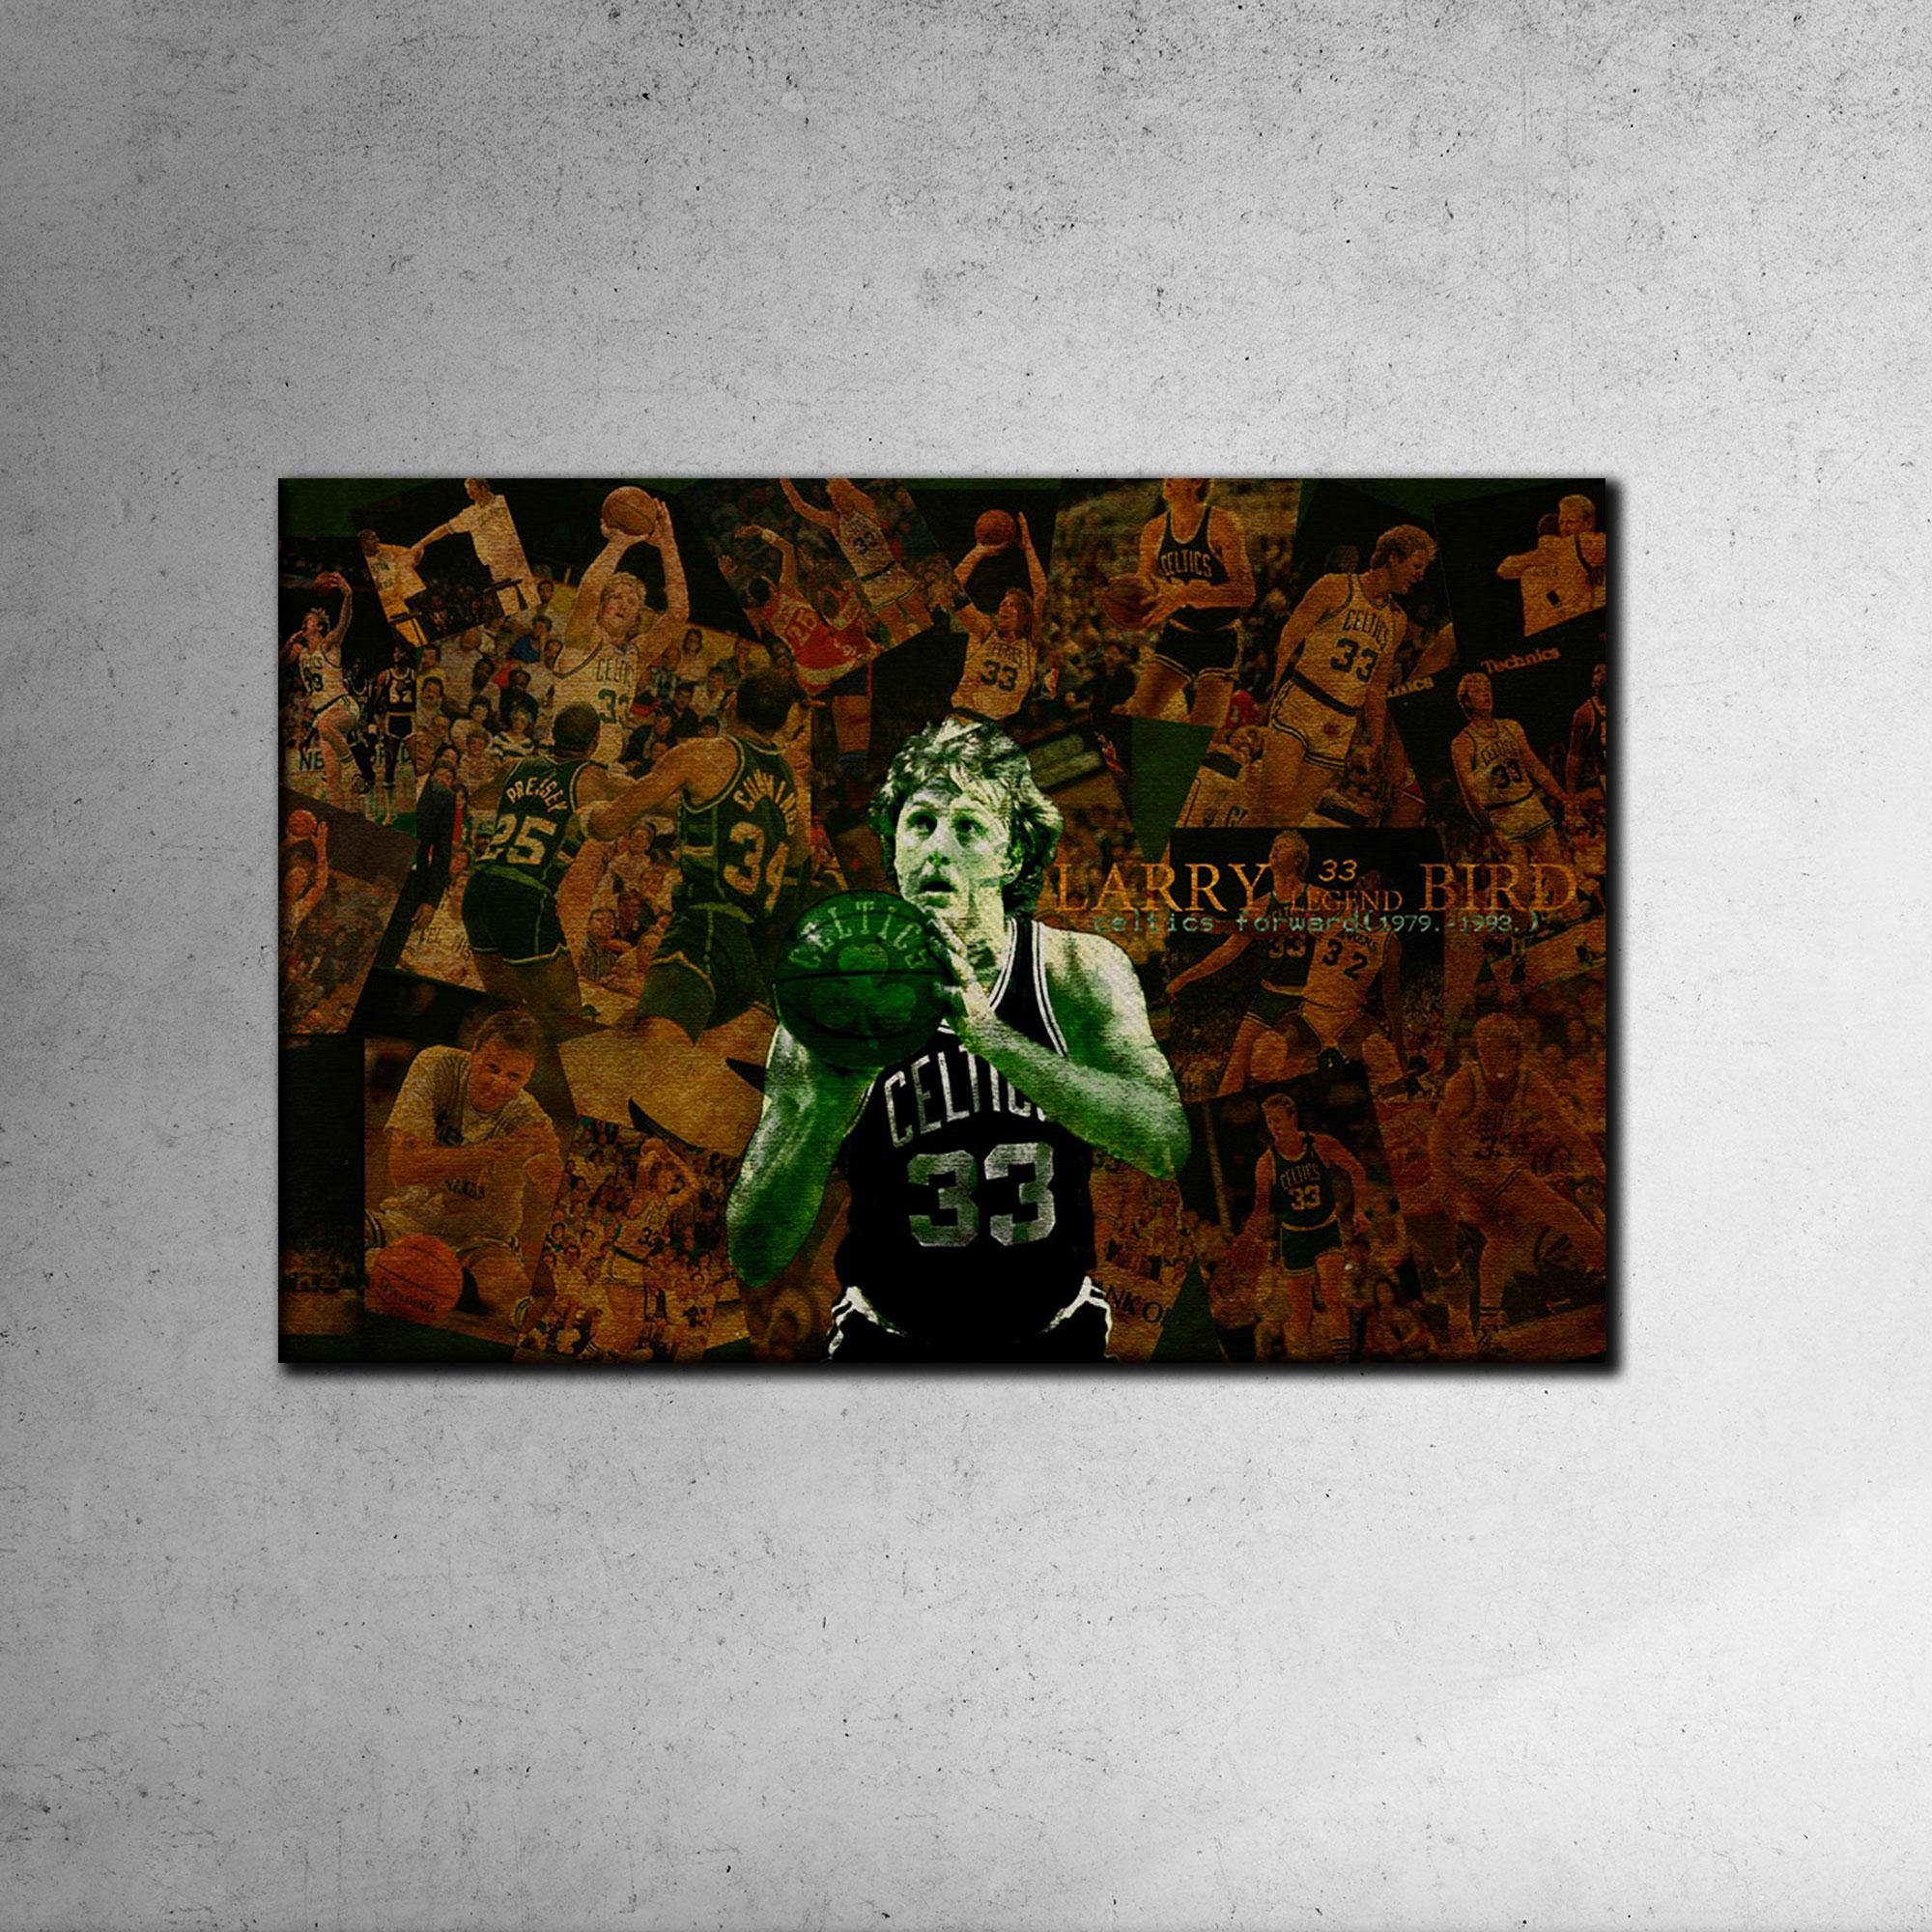 Larry Bird Canvas Tablo (Nba-canvas-larry1)